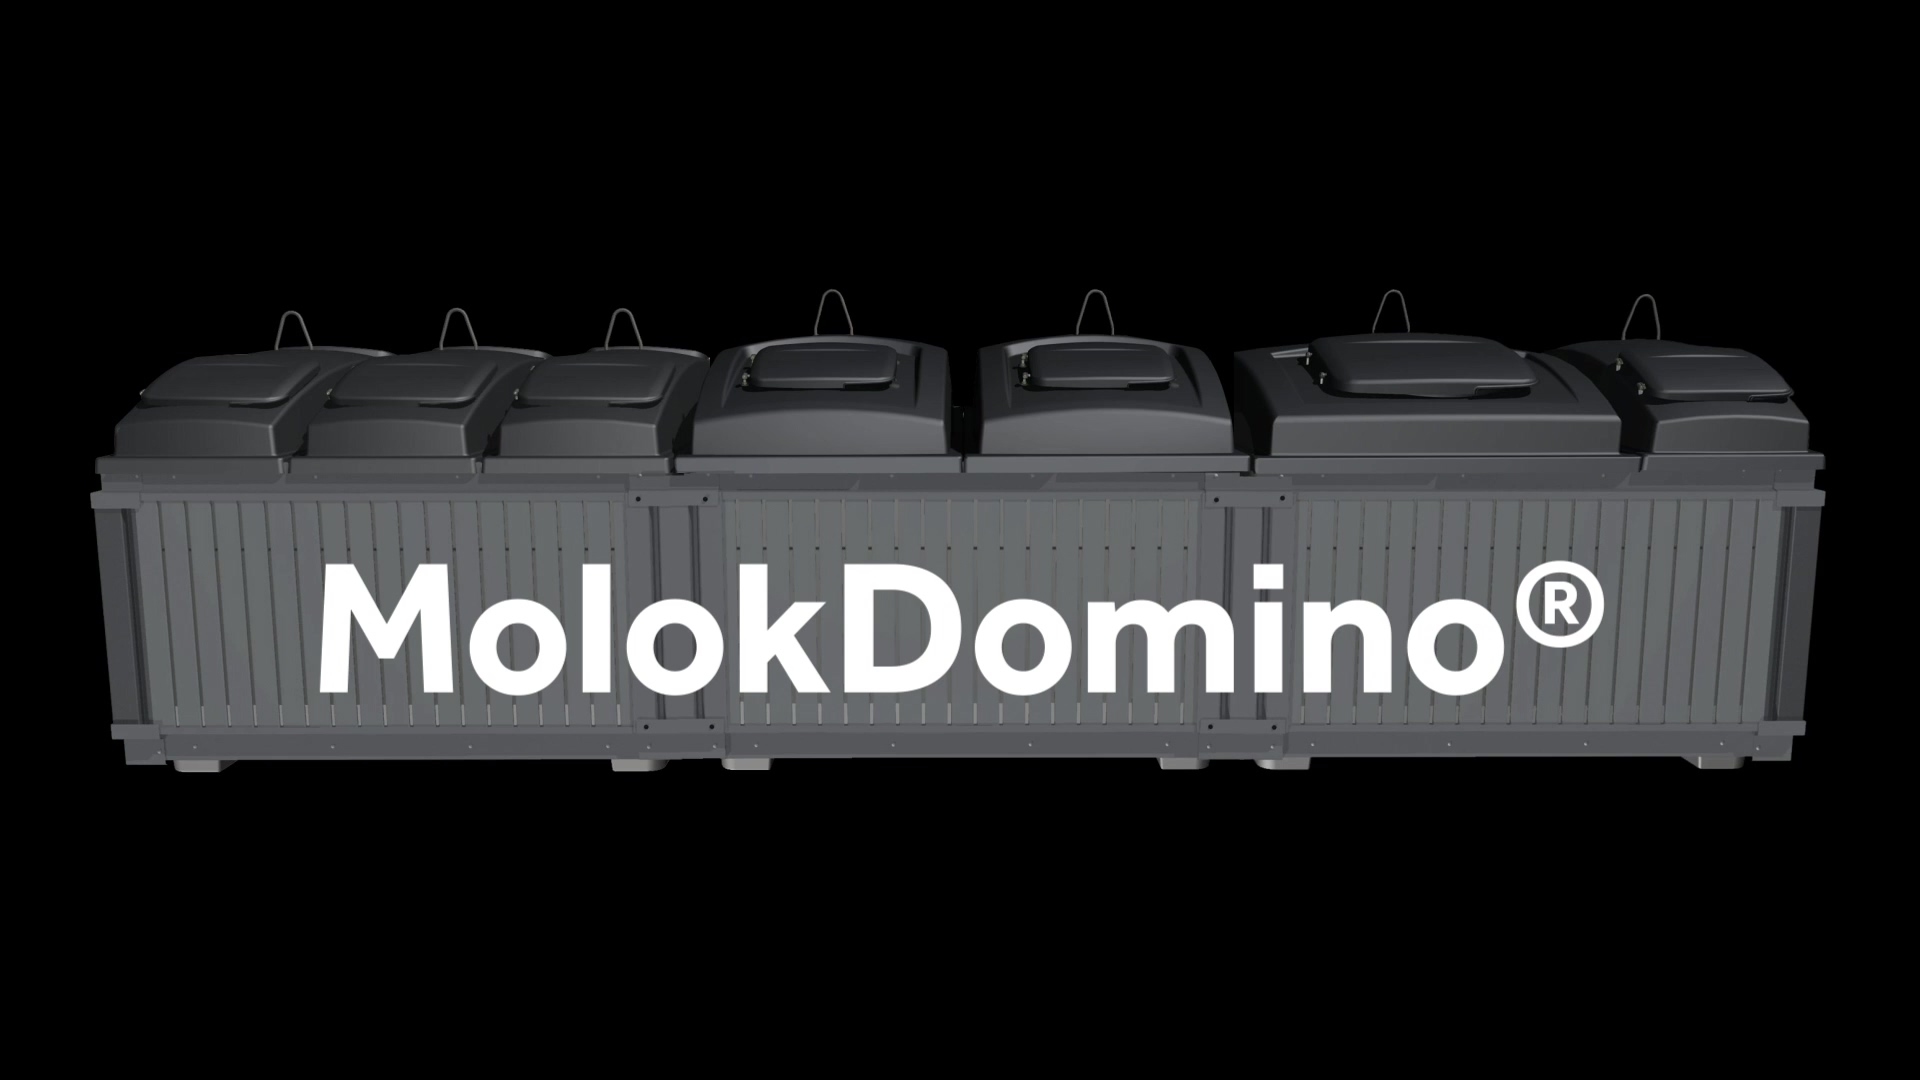 MolokDomino-challenge-video